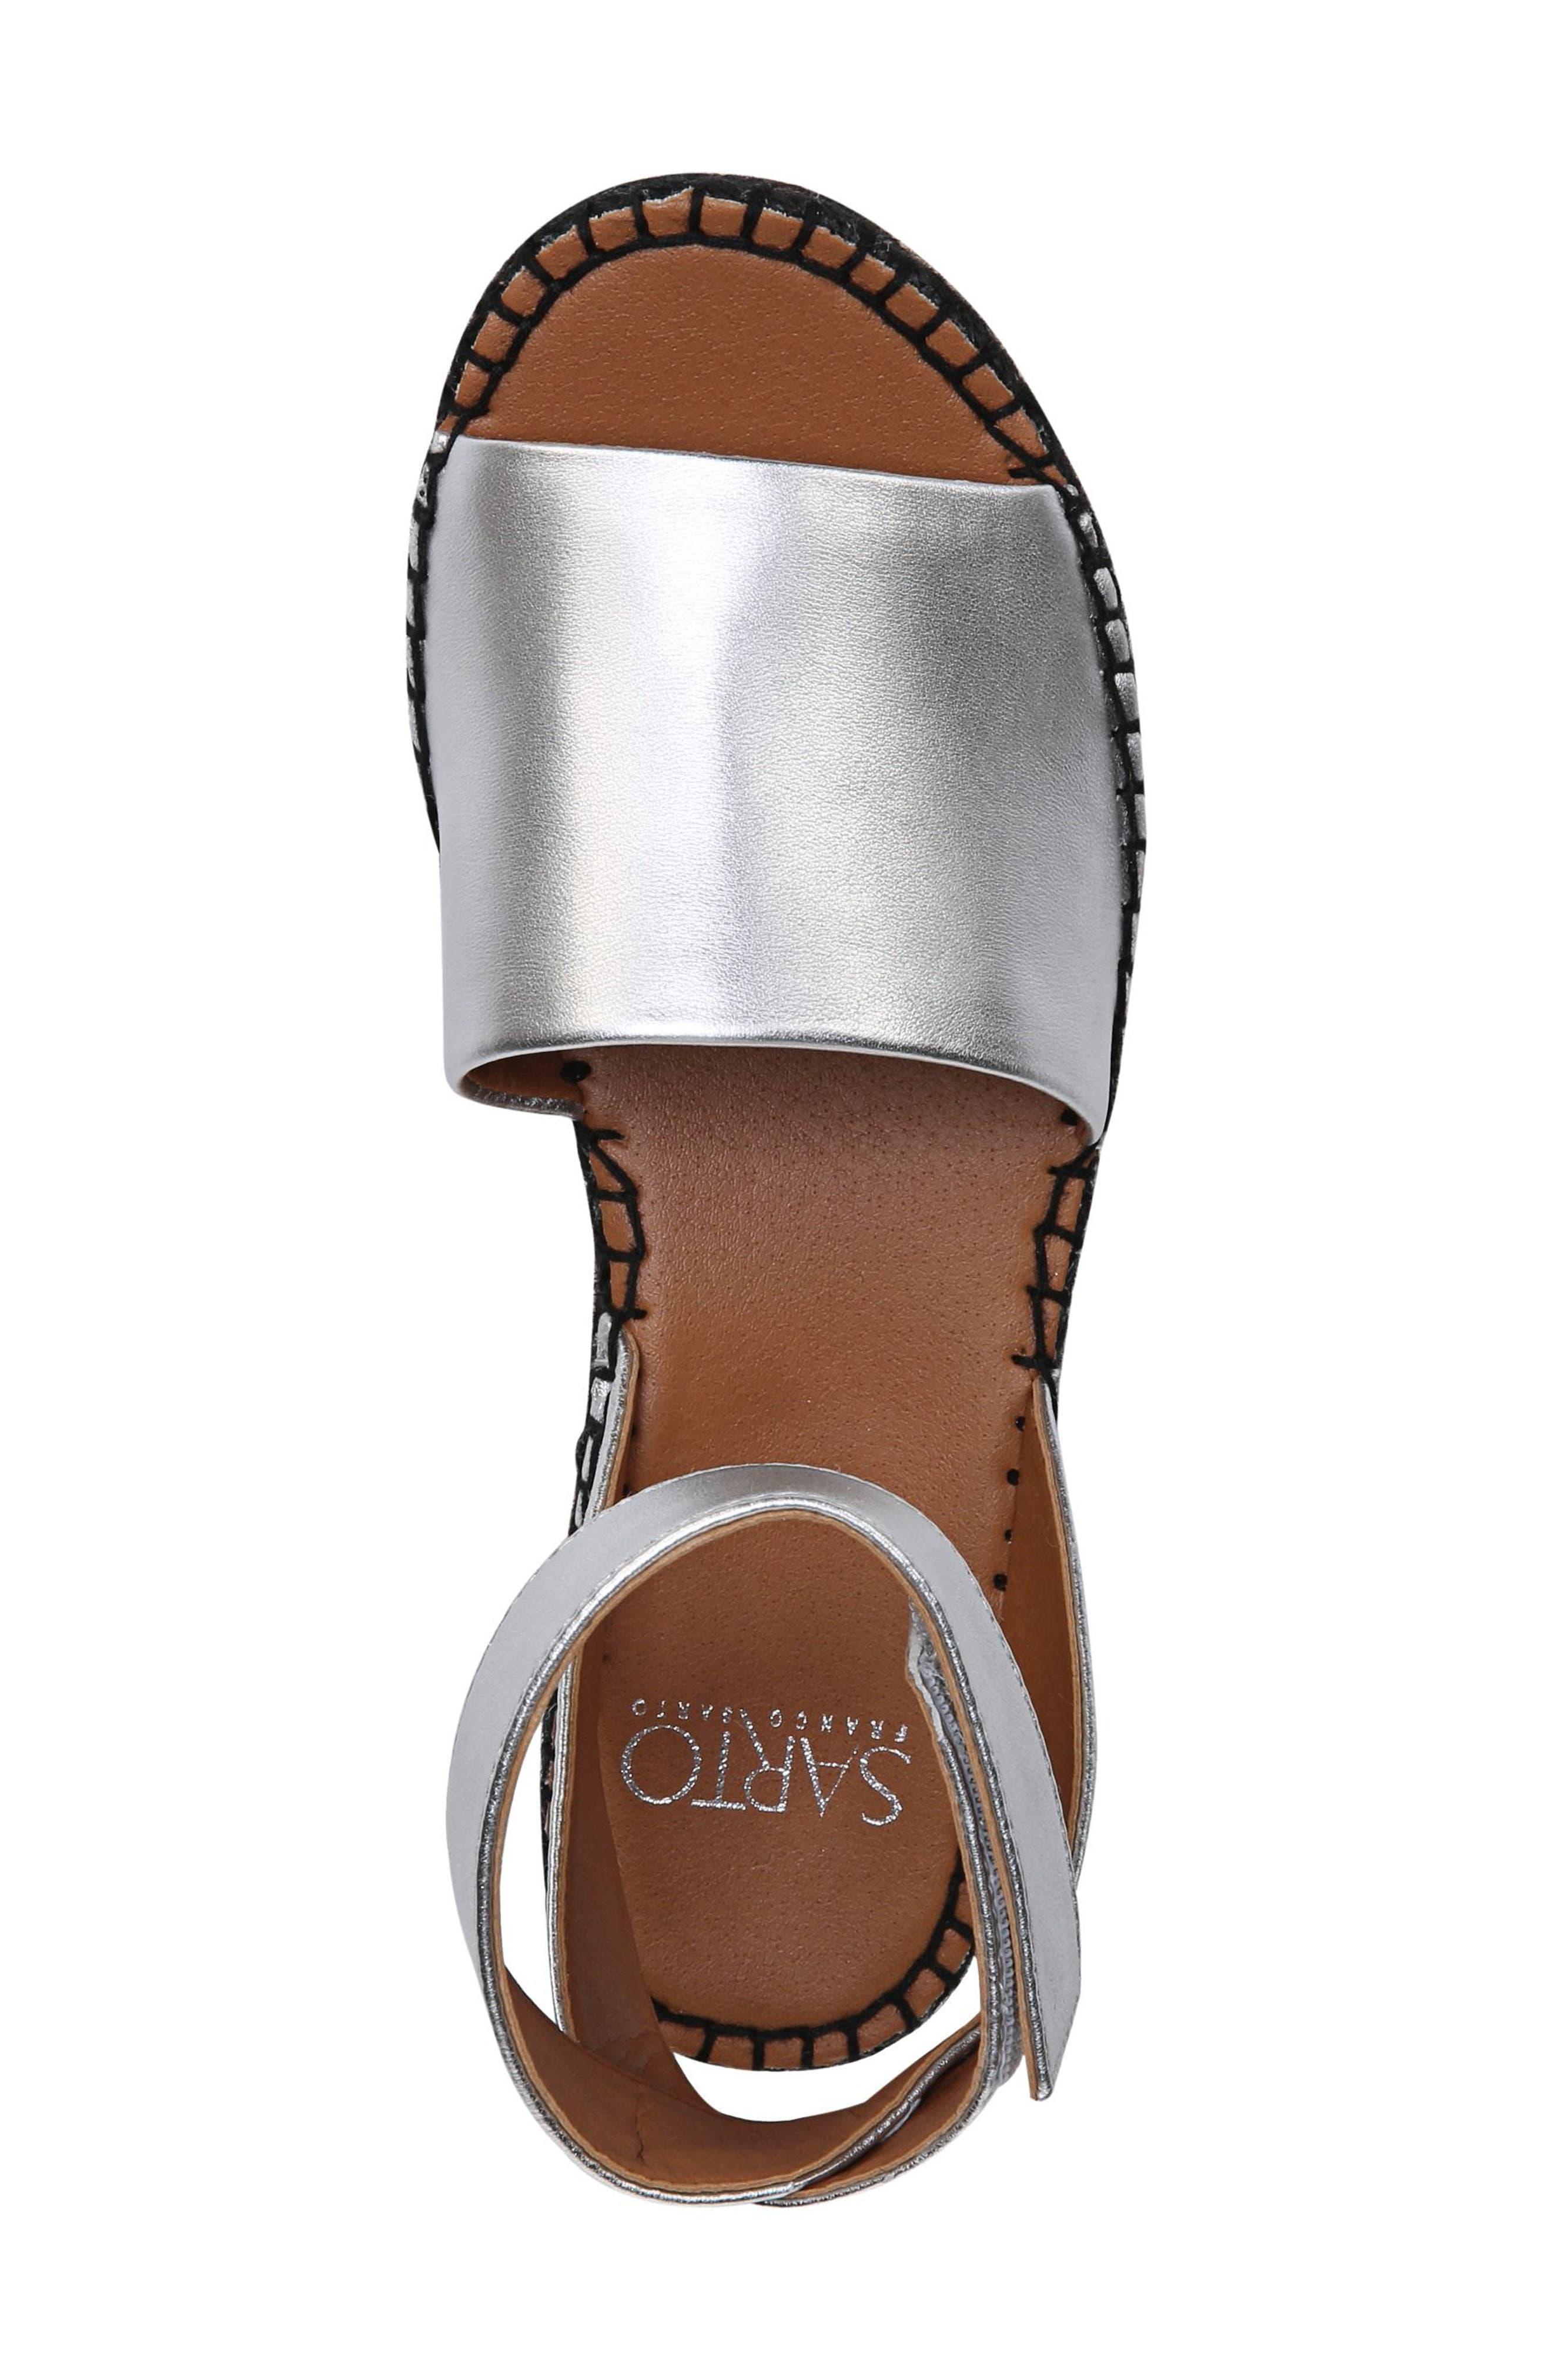 Maisi Platform Espadrille Sandal,                             Alternate thumbnail 5, color,                             Silver Leather